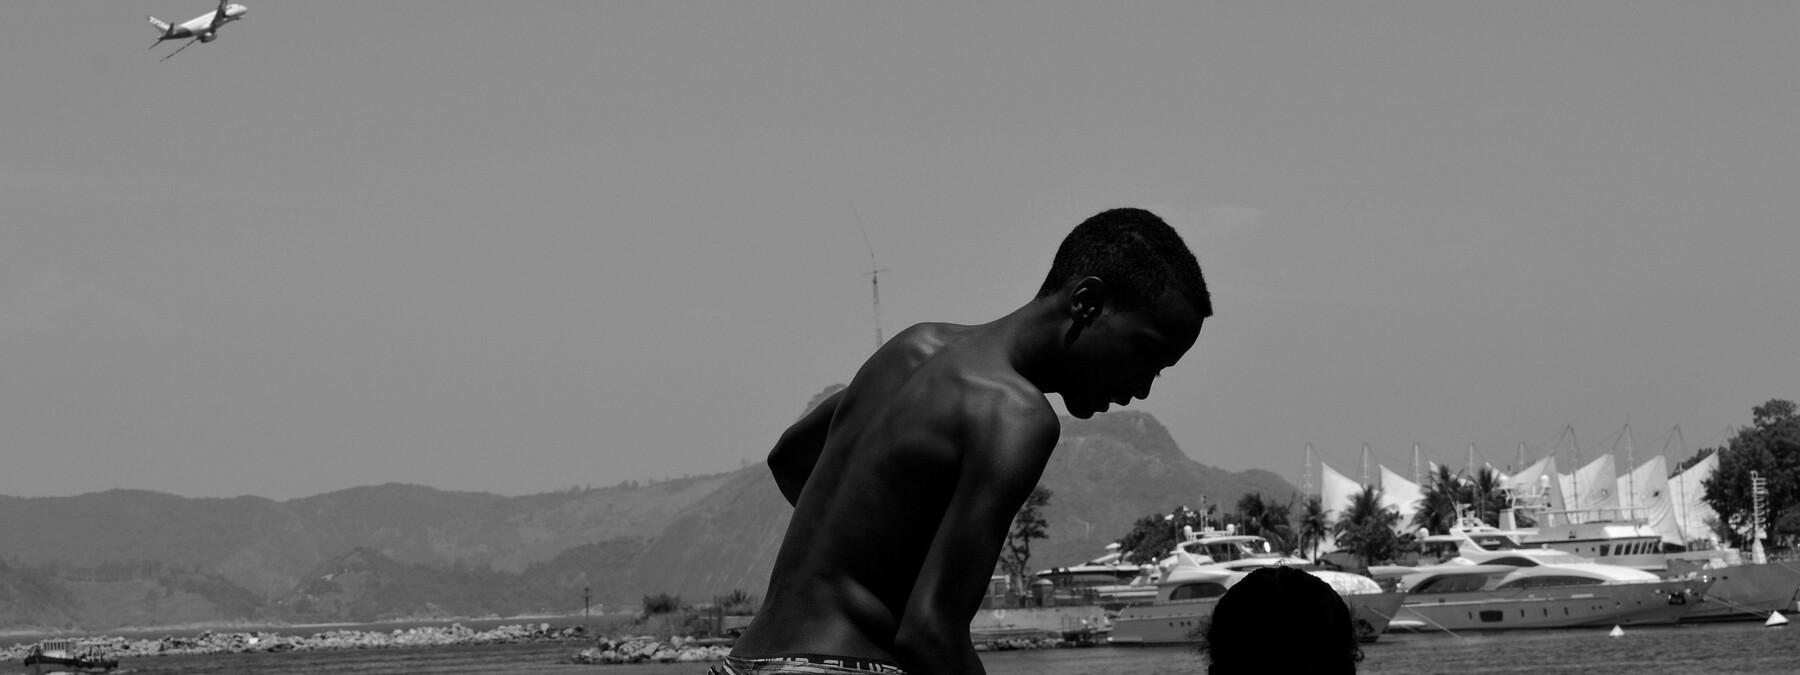 Aeterno_Praesenti Photography